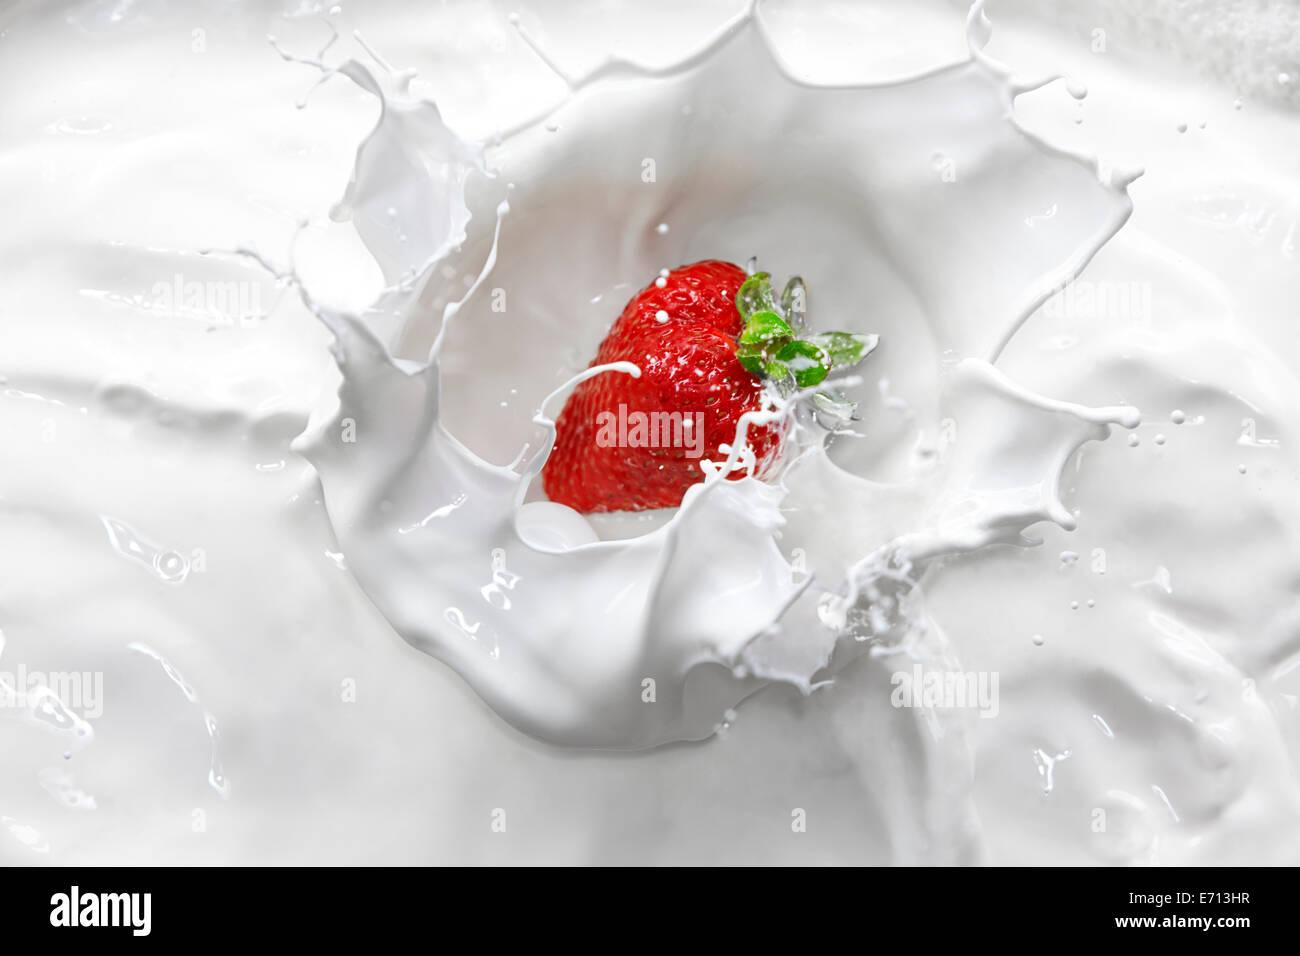 Strawberry splashing into cream - Stock Image